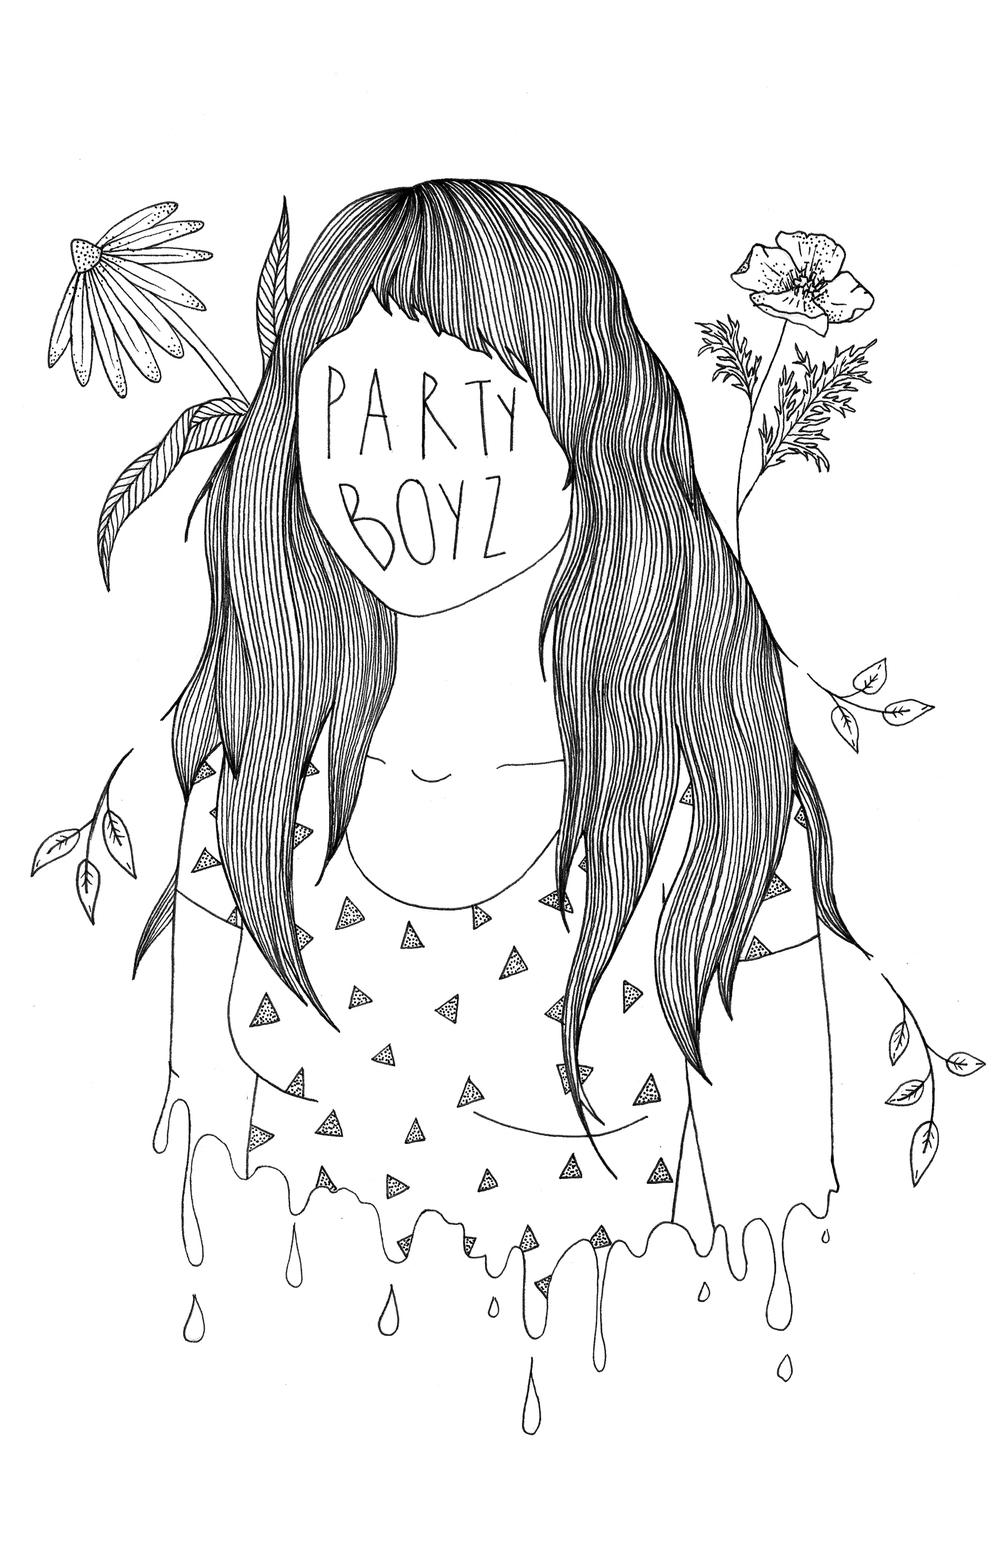 Illustration for Party Boyz Zine #3, 2016